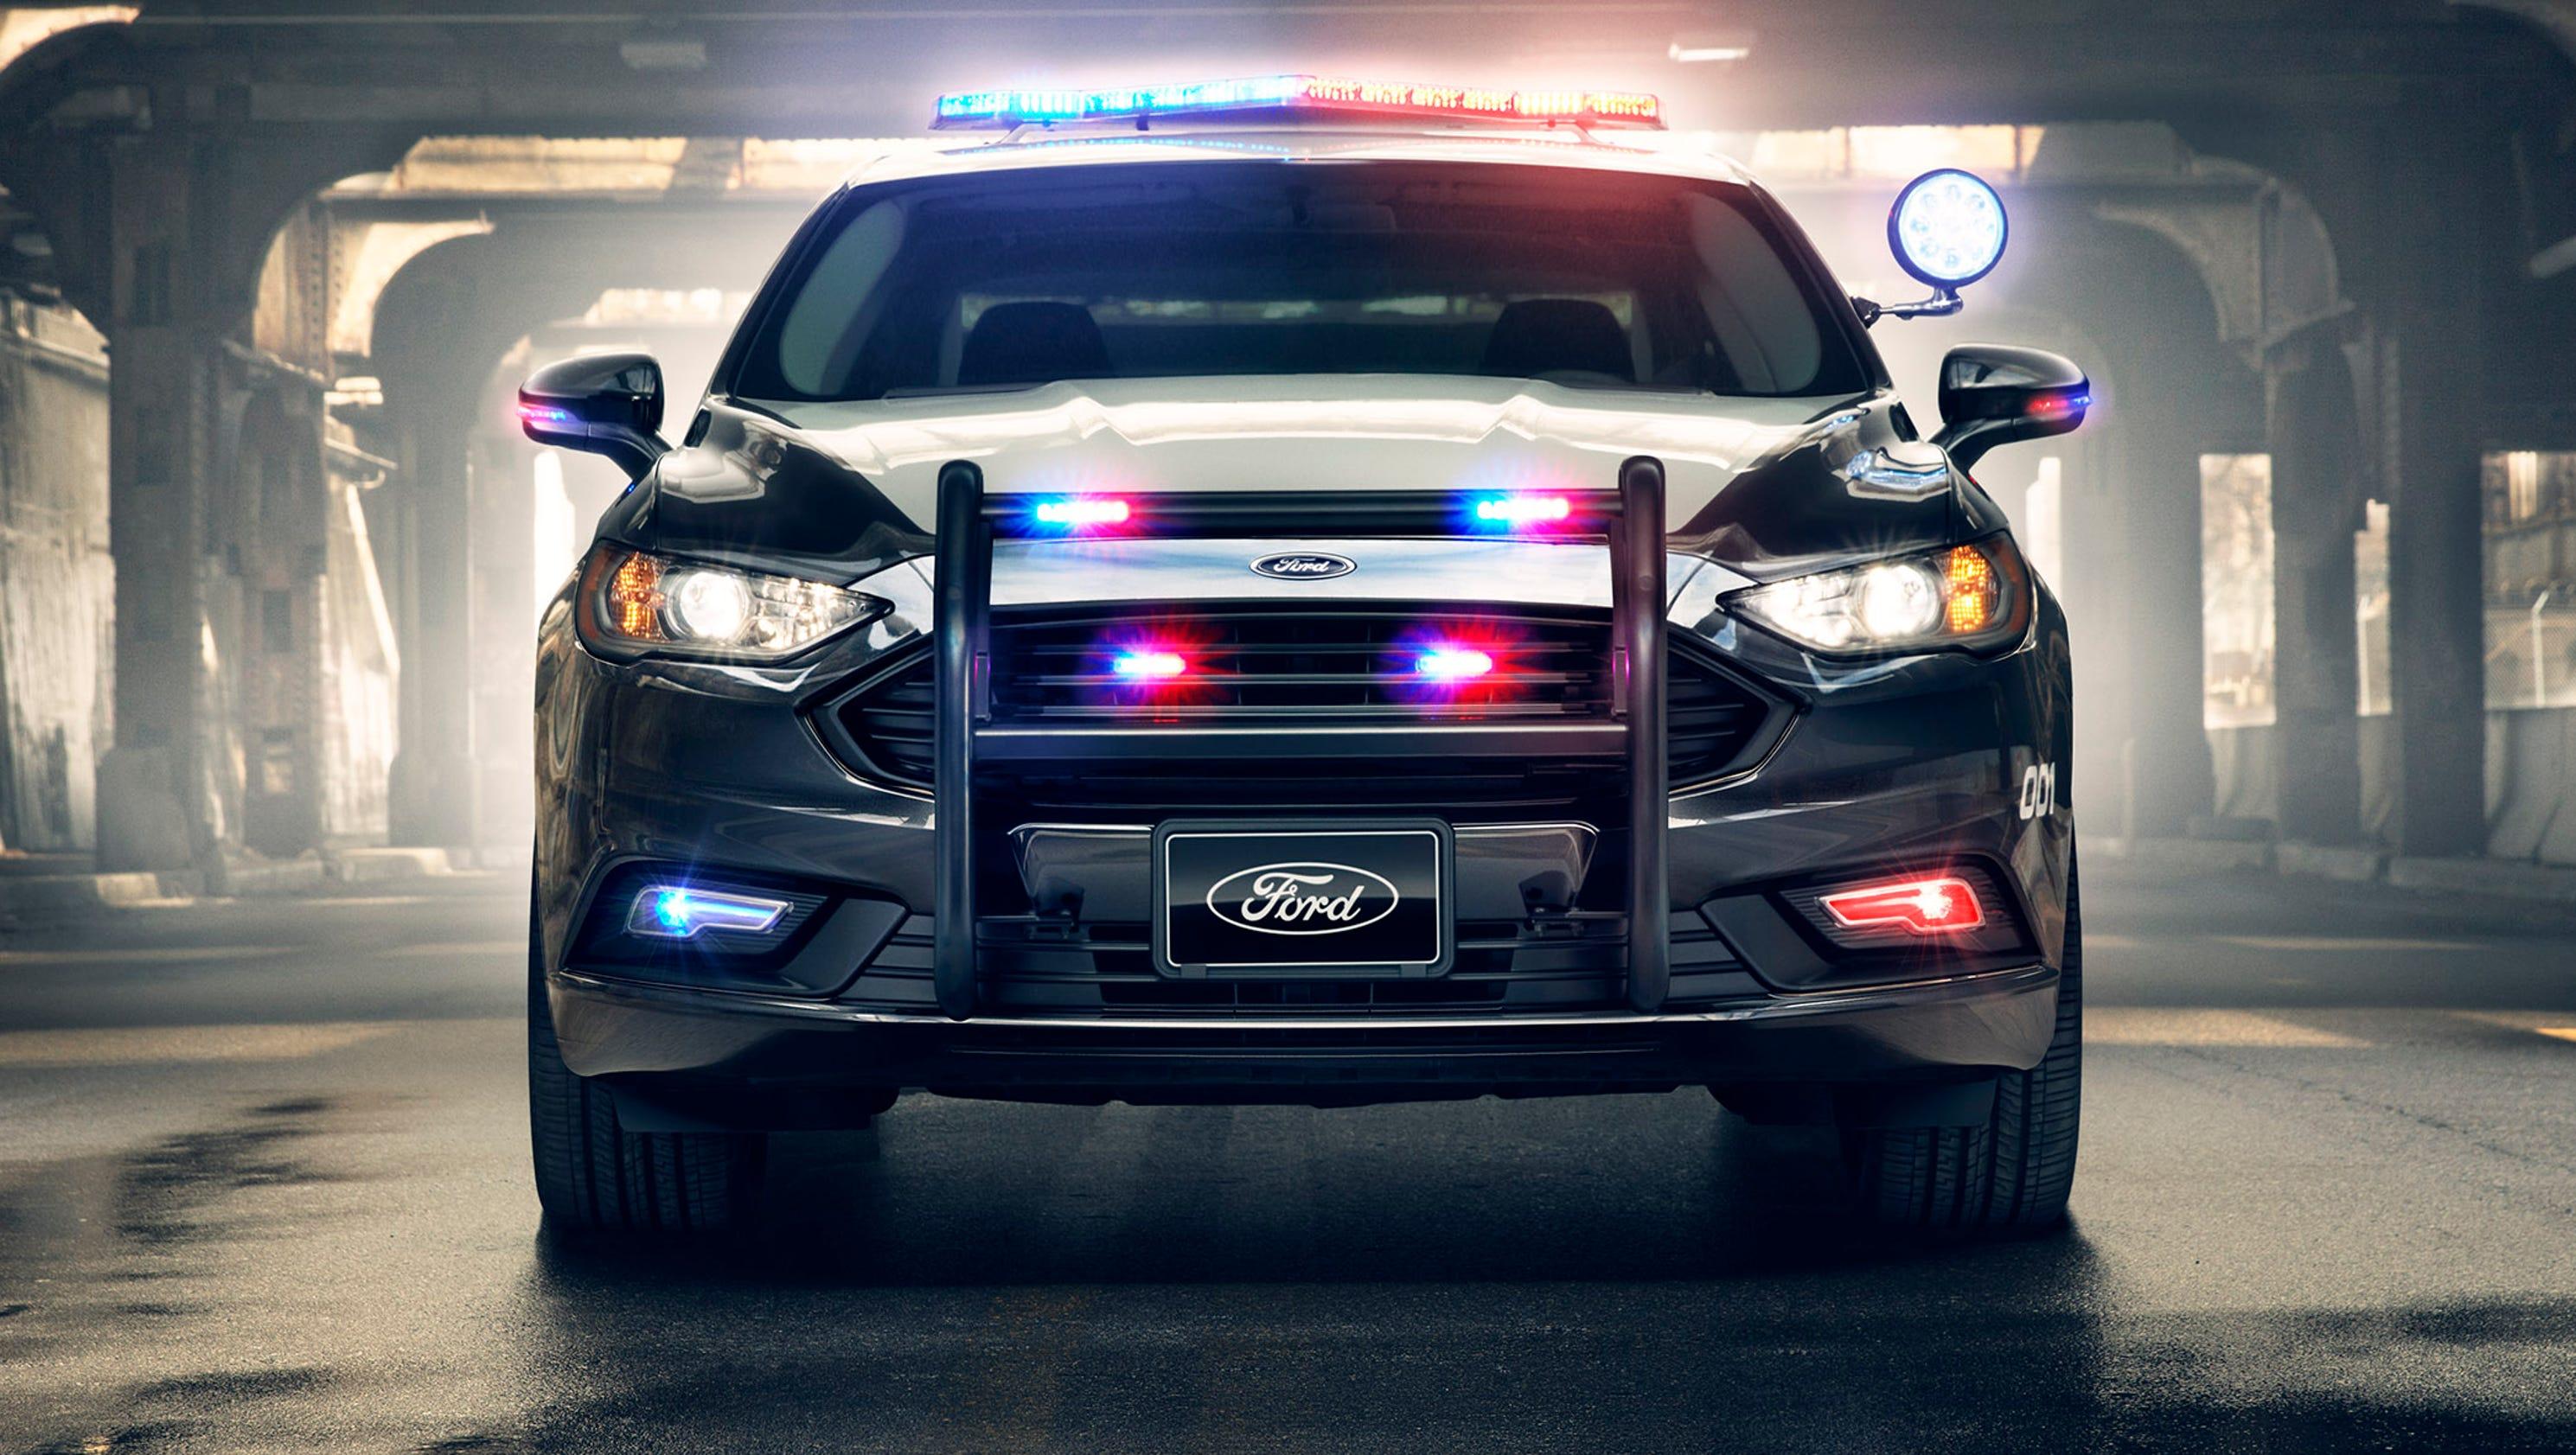 ford unveils first 39 pursuit rated 39 hybrid police car for. Black Bedroom Furniture Sets. Home Design Ideas